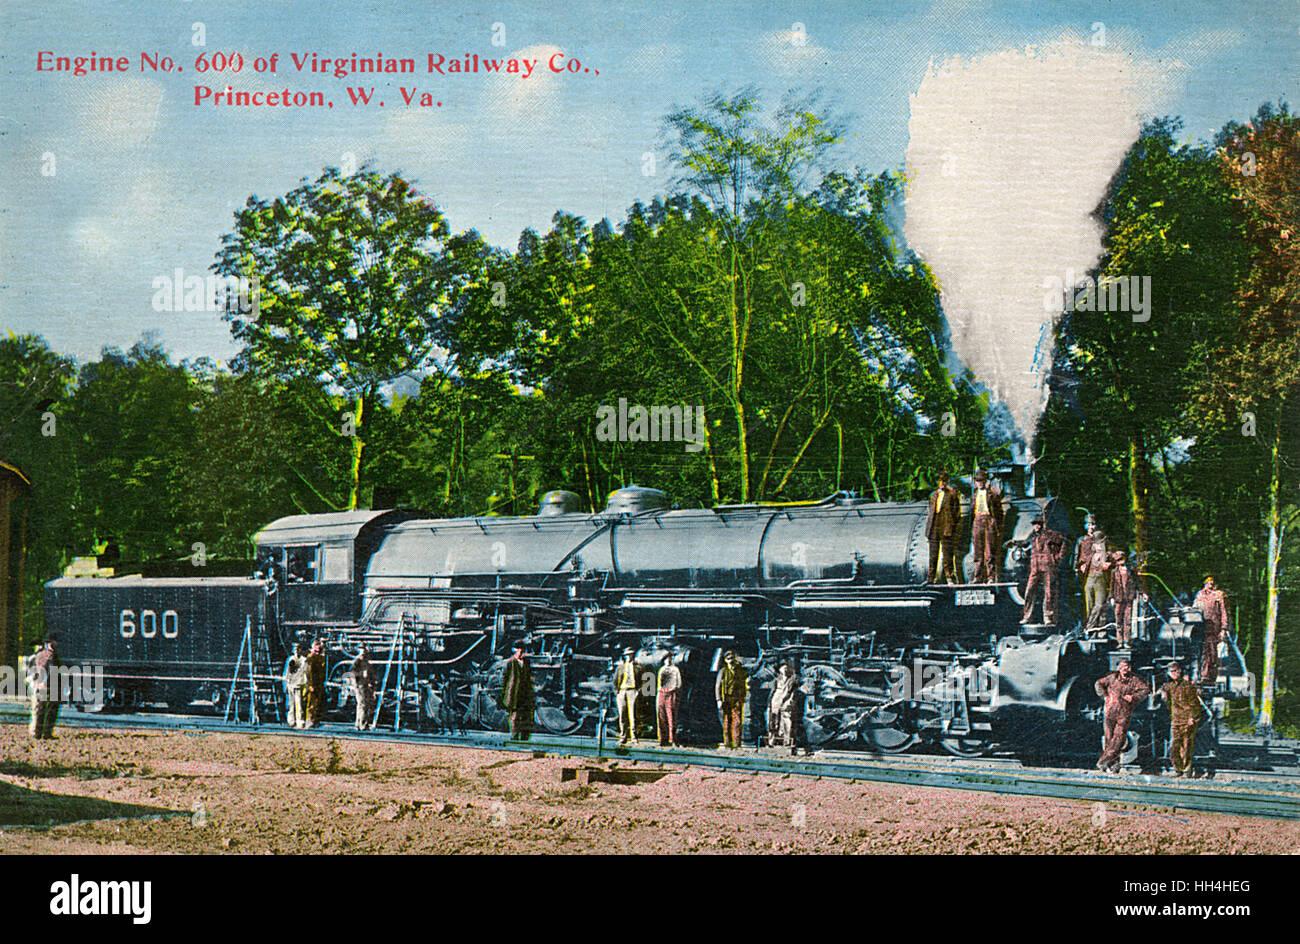 Engine no. 600, Virginian Railway Company, Princeton, West Virginia, USA. - Stock Image